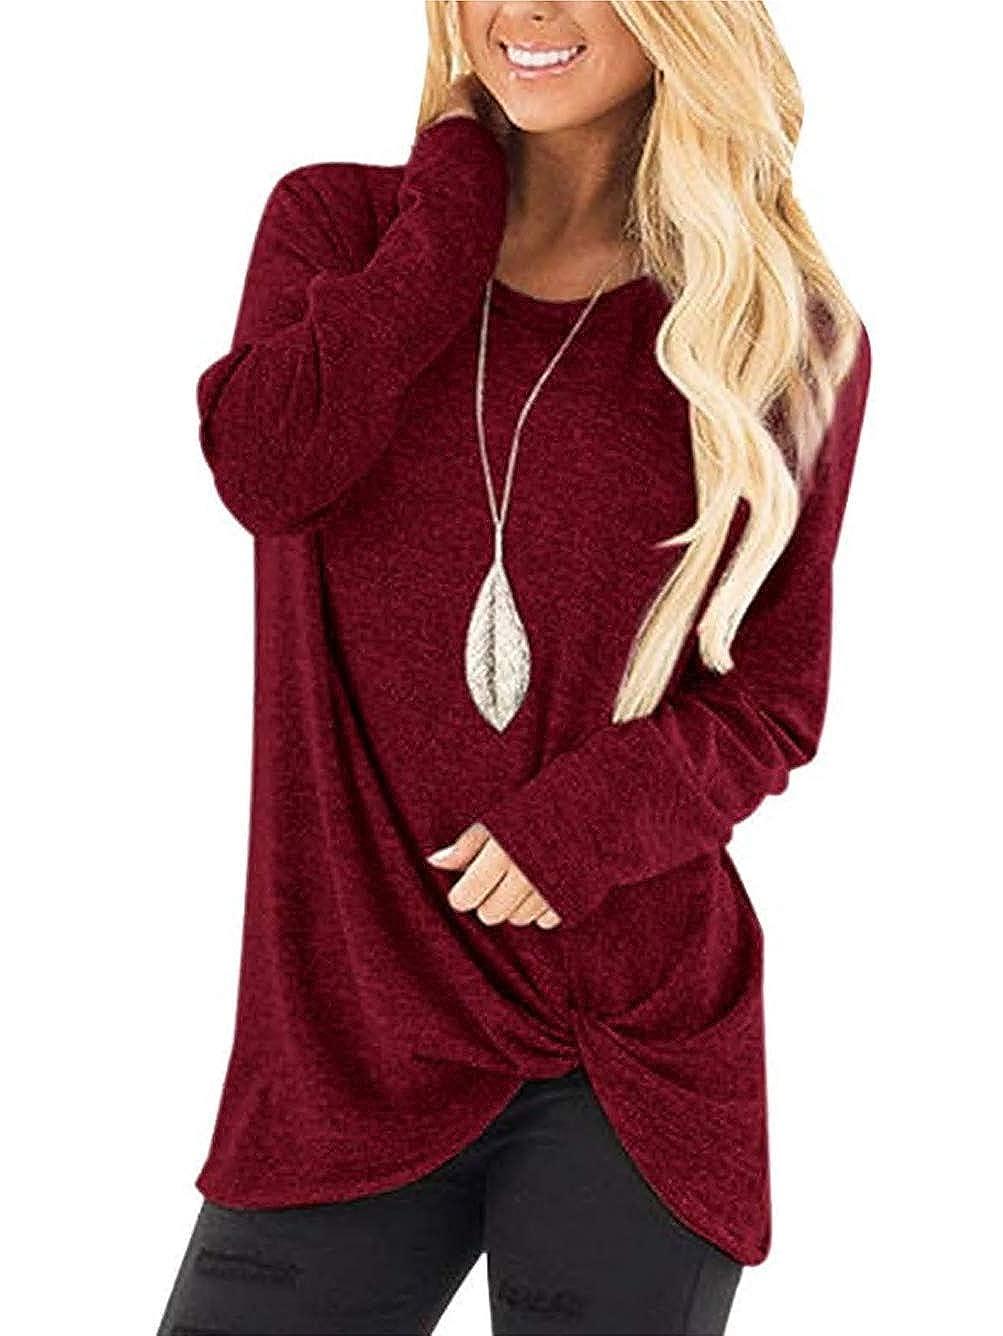 Olidarua Women's Casual Long Sleeve Tops Plain Round Neck Loose Fit Shirts Blouse Sweatshirts